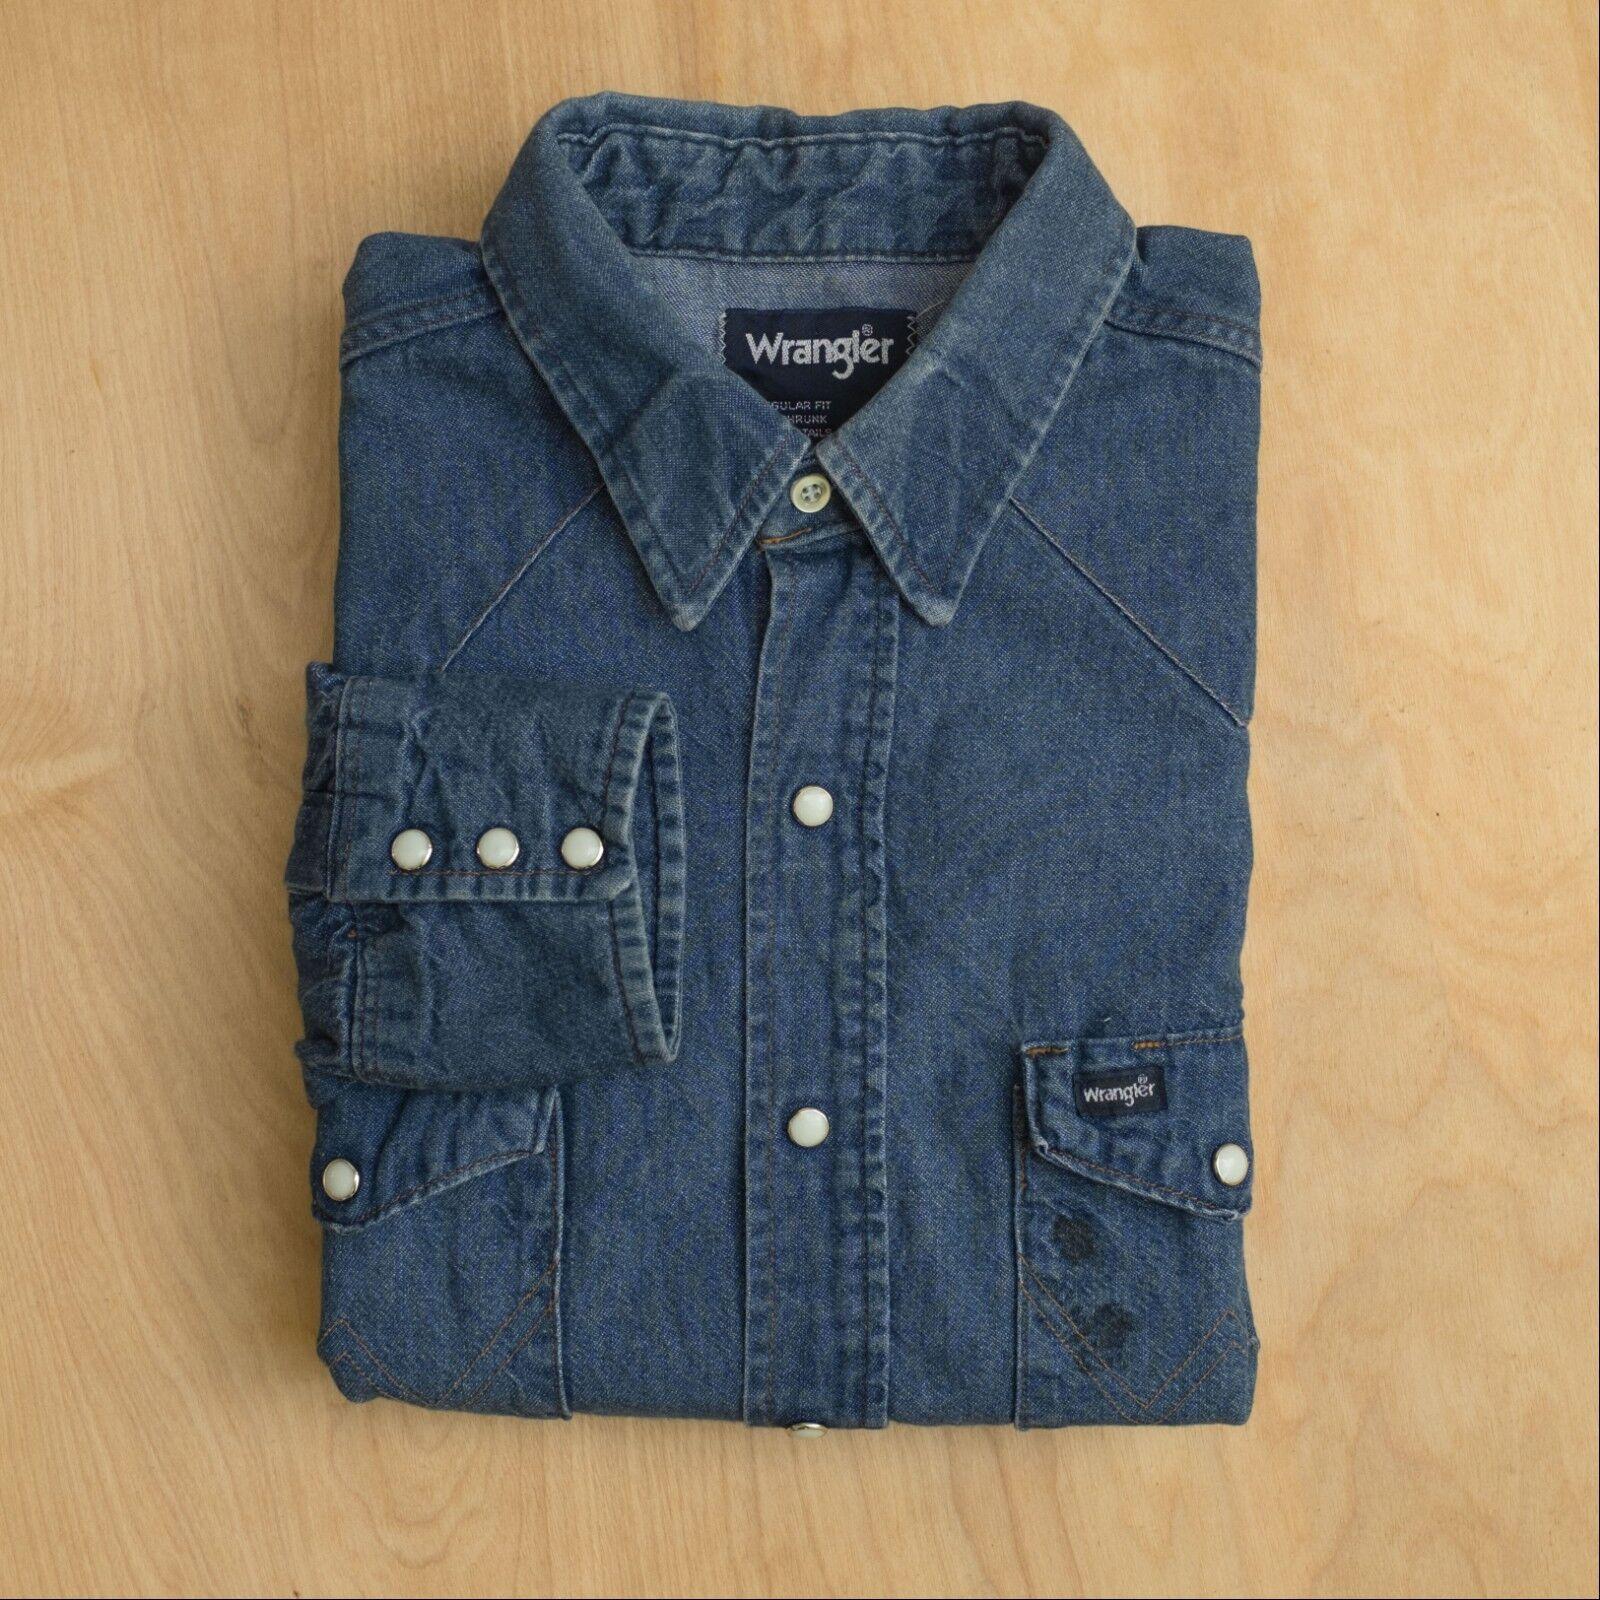 Vtg usa made Wrangler Denim Western Pearl Snap Shirt bluee size L